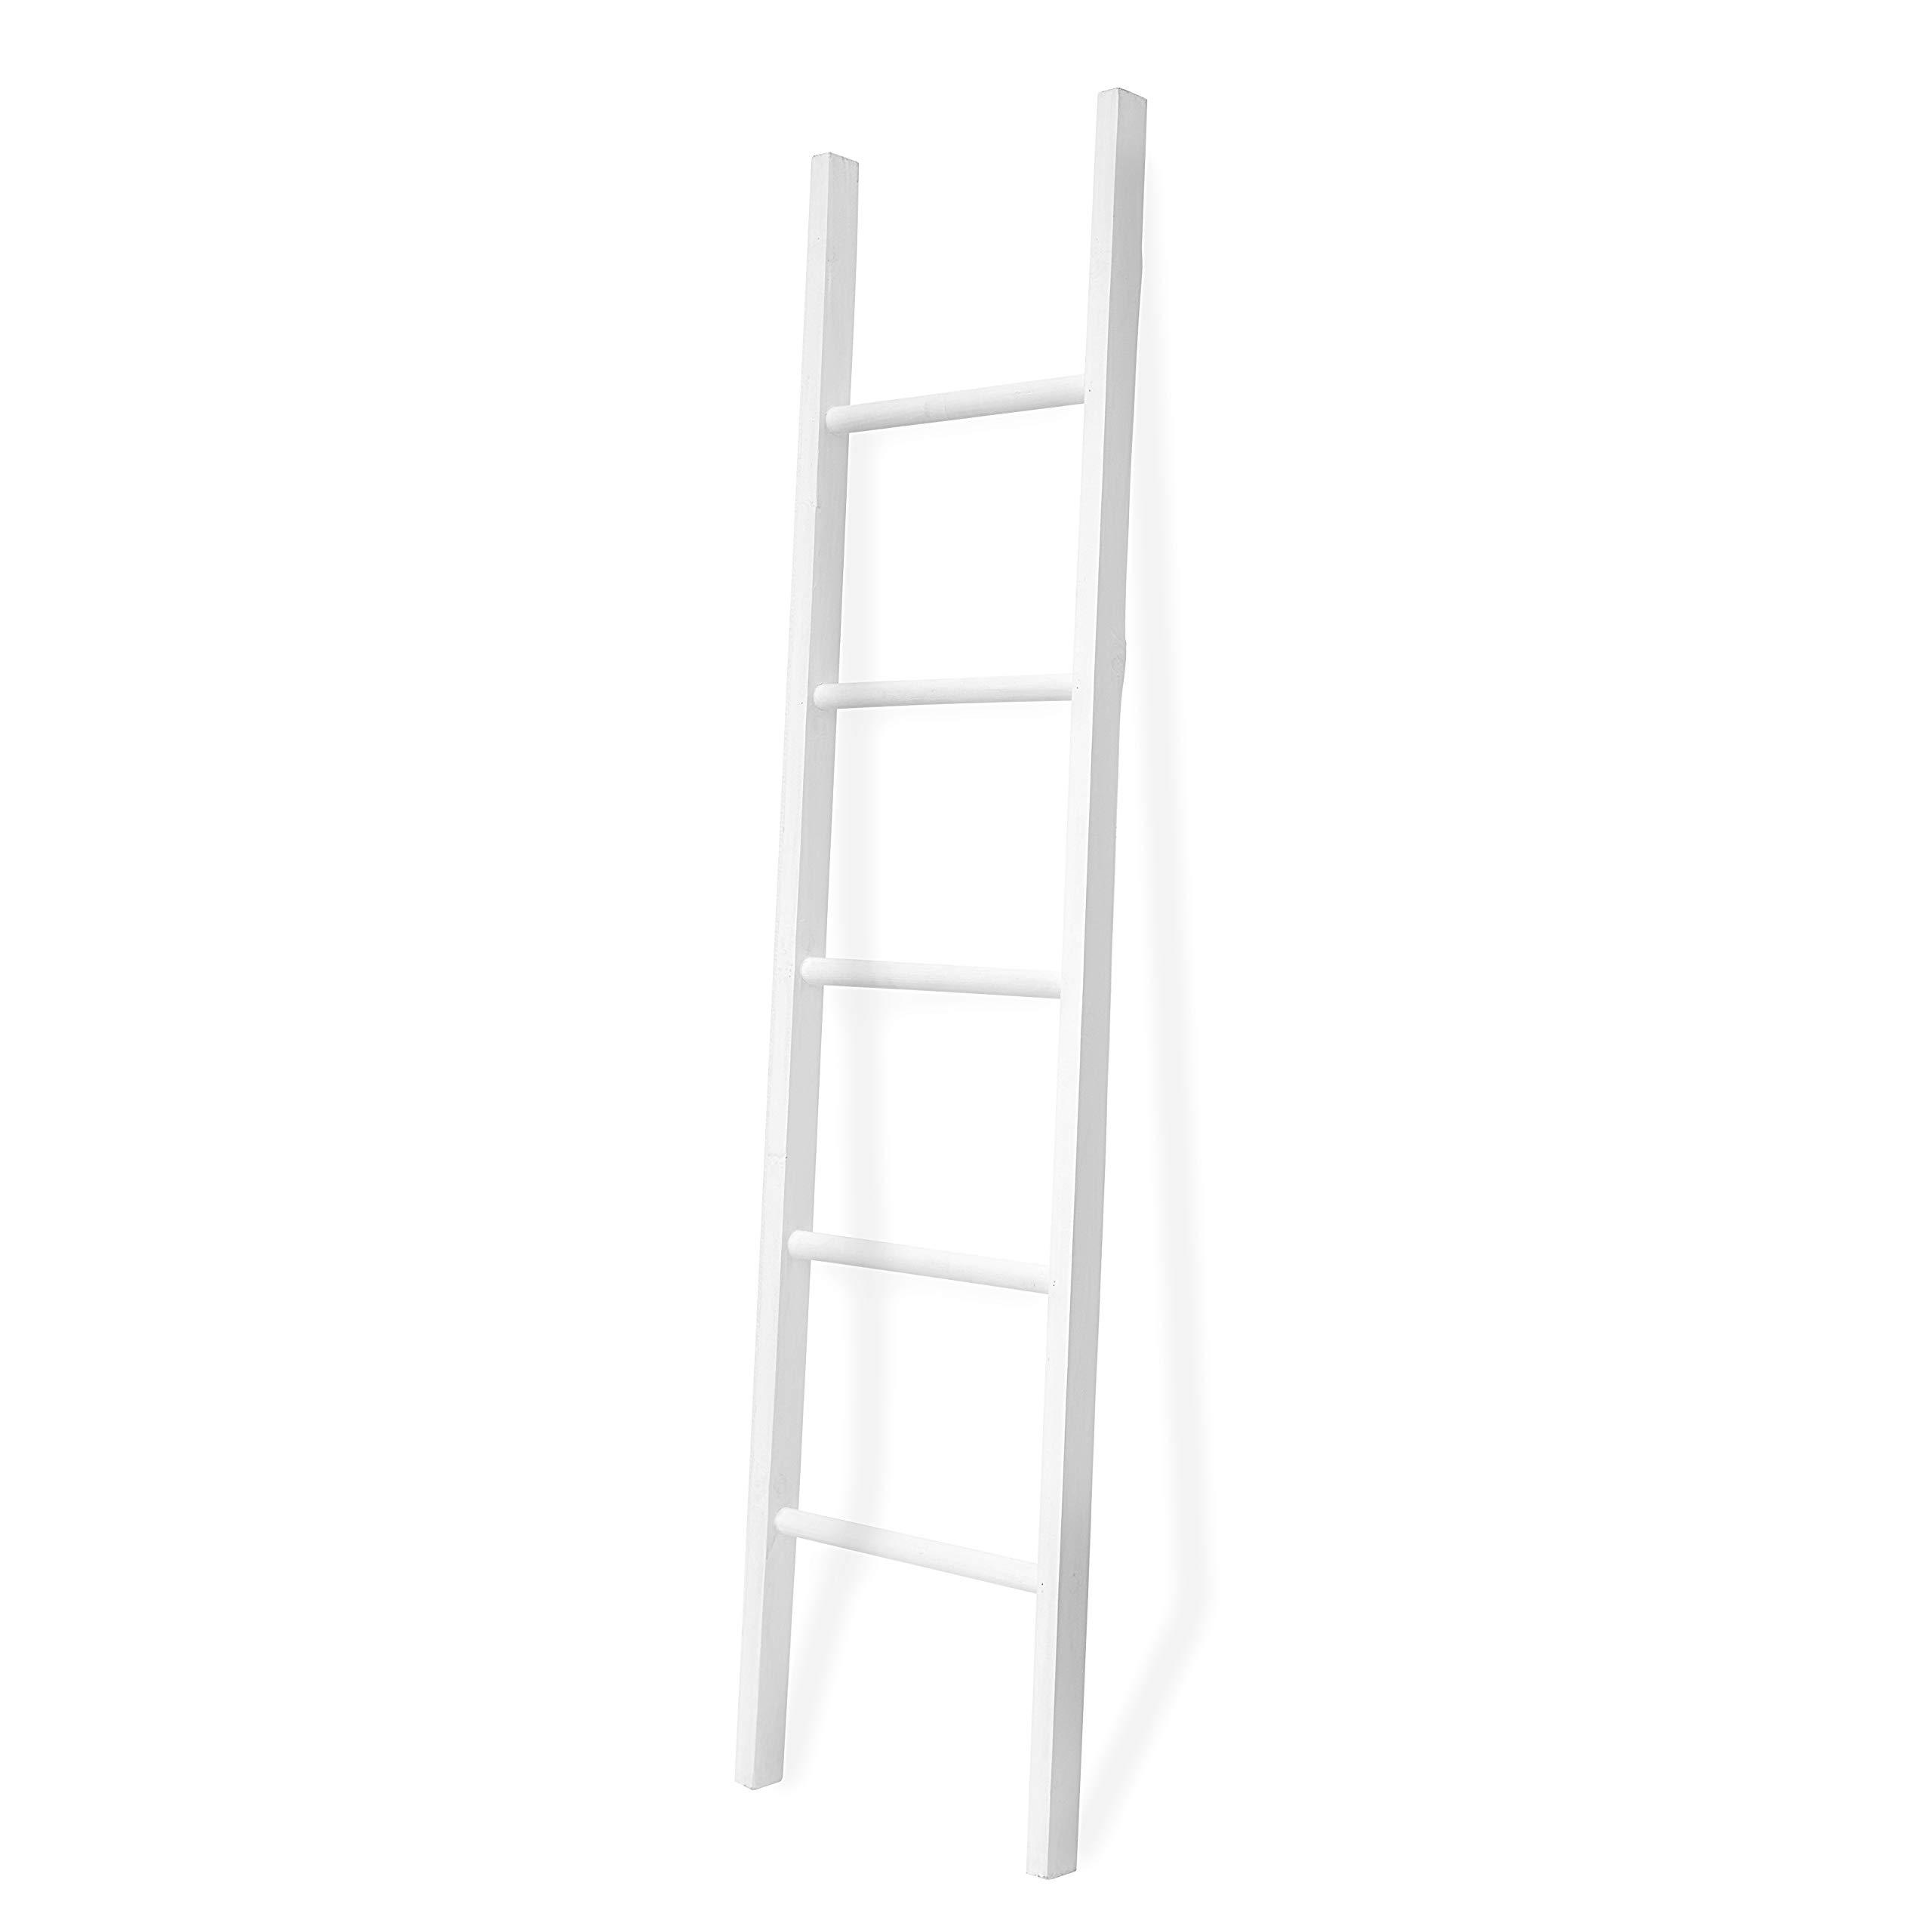 FUIN 20 Ft Wood Decorative Wall Leaning Blanket Ladders Bathroom ...